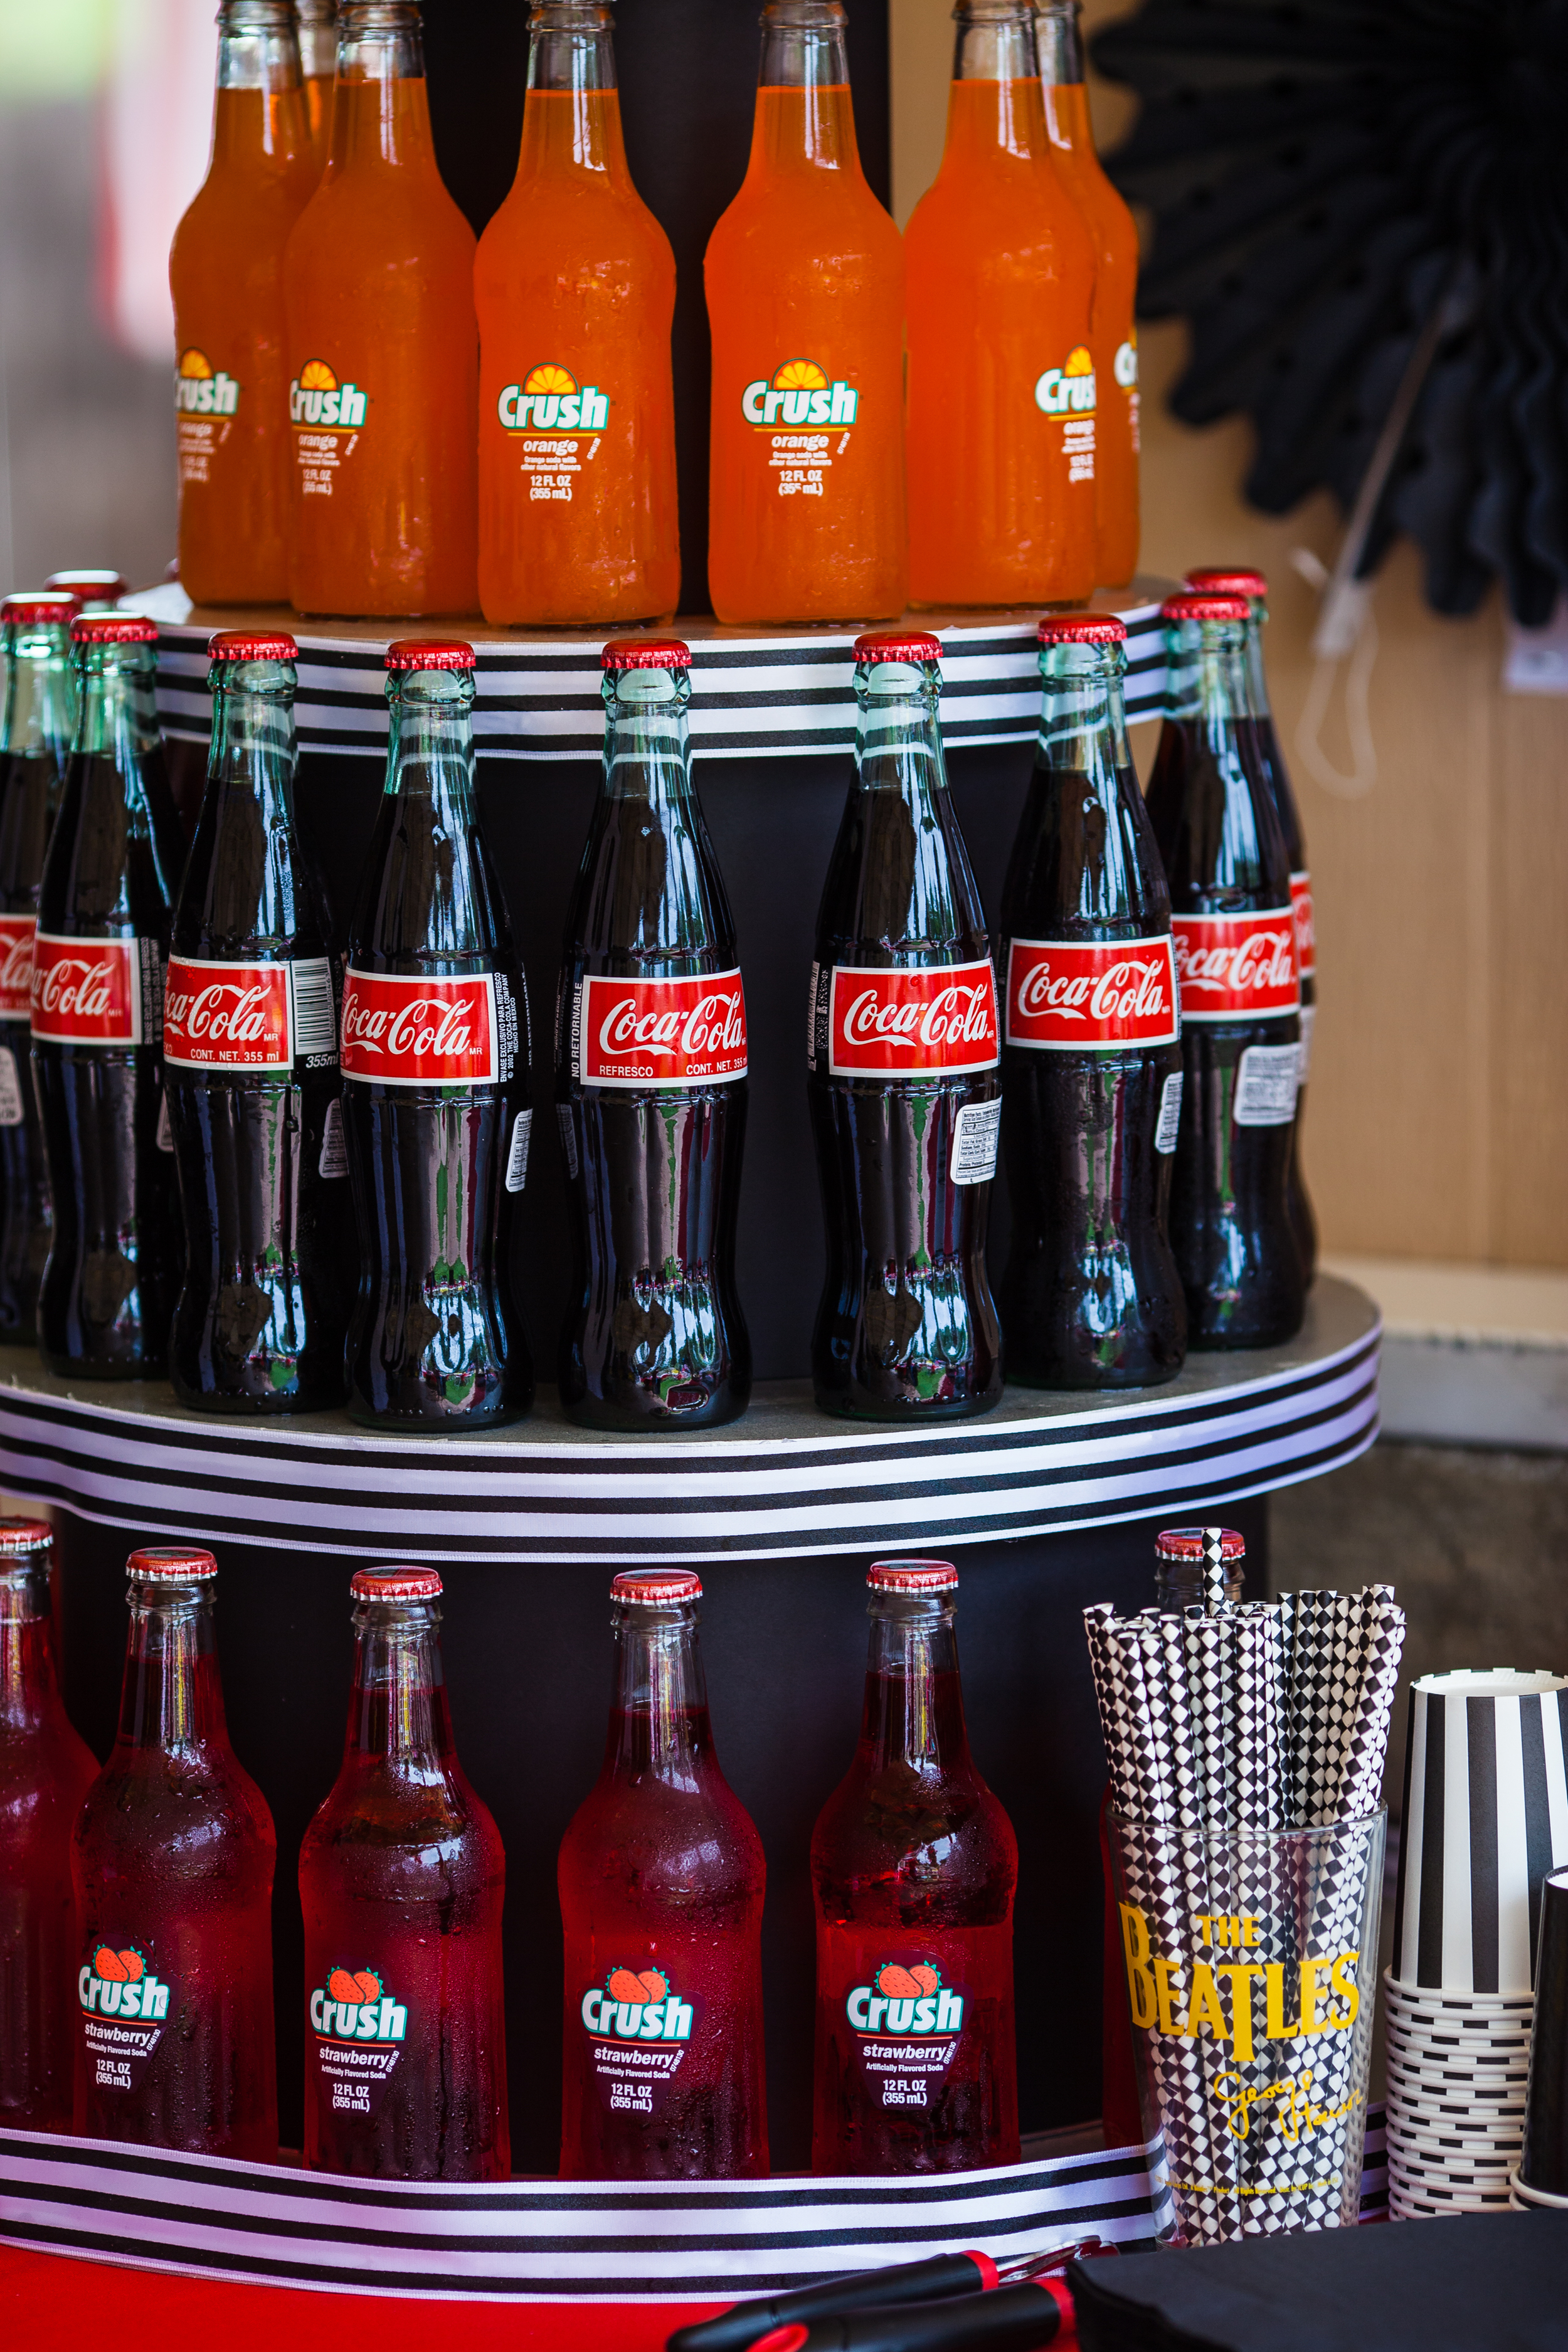 Beatles Bash Bottled Coke tower by Down Emery Lane.